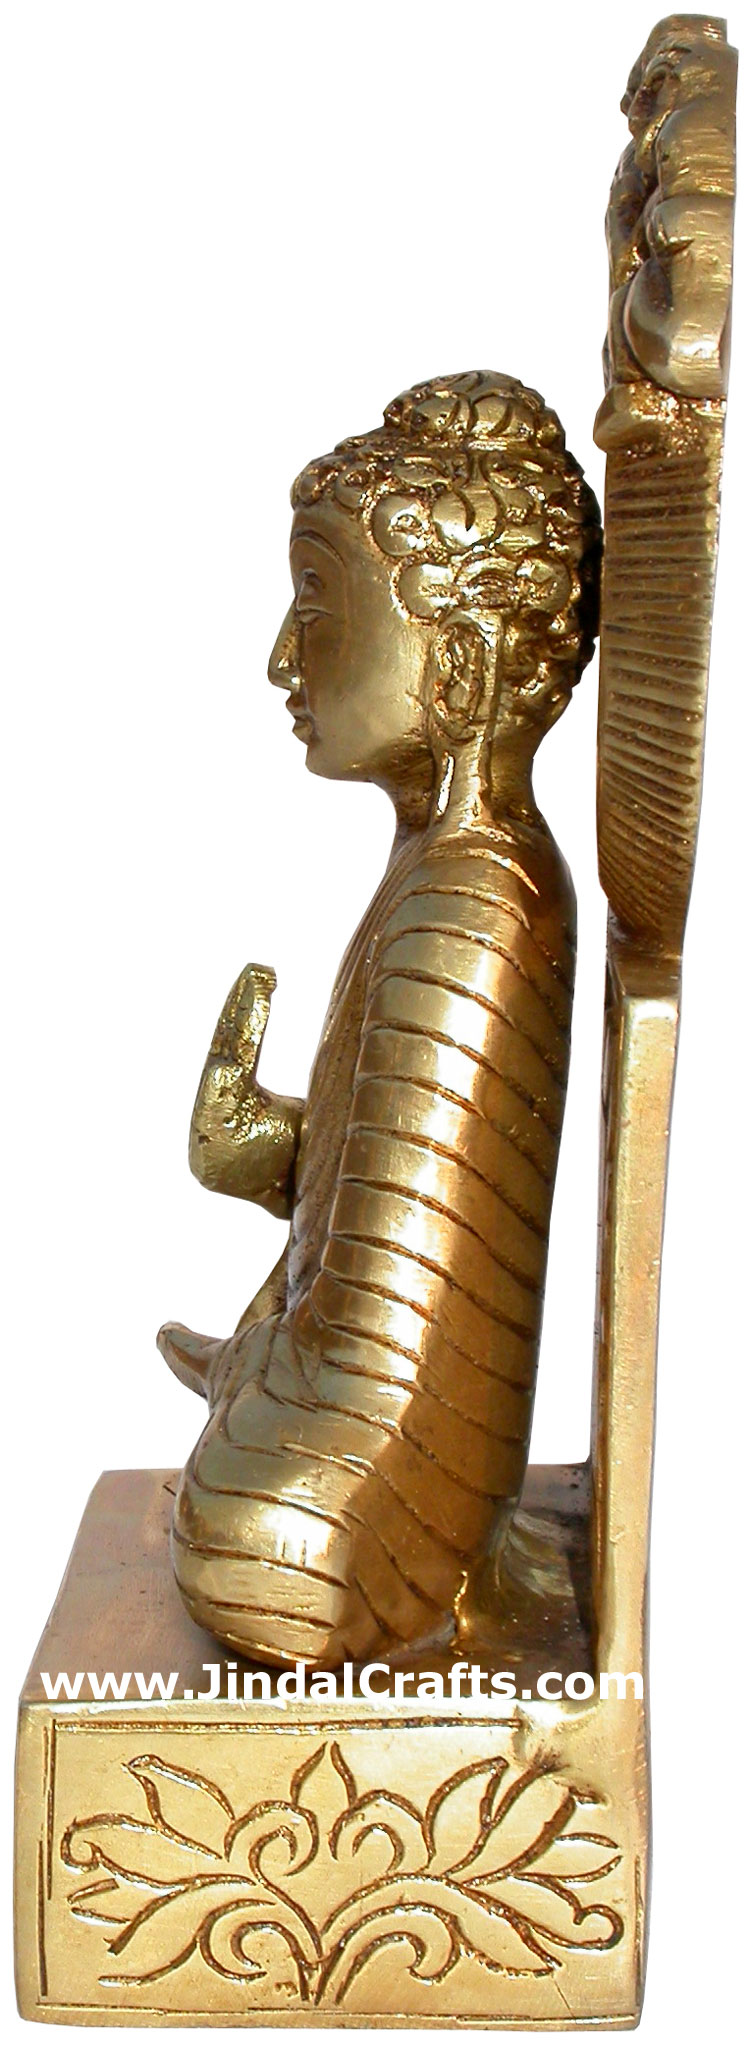 Buddha Figurines Buddhism Artifacts Home Decor Statues